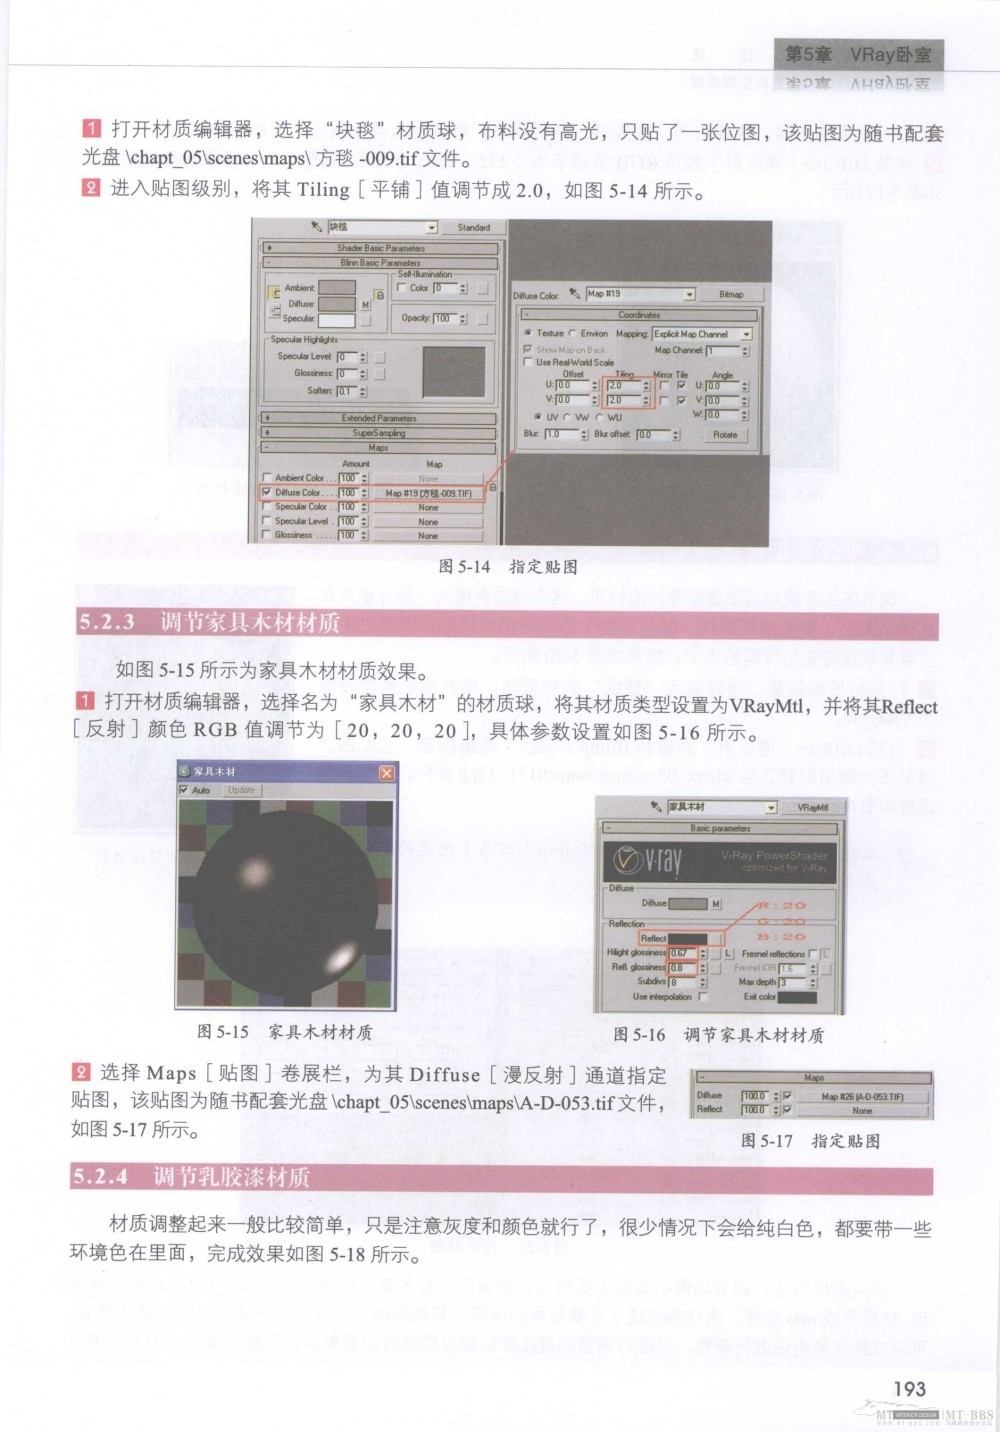 水晶石技法-3ds_Max&VRay室内空间表现_水晶石技法-3ds_Max&VRay室内空间表现_页面_199.jpg